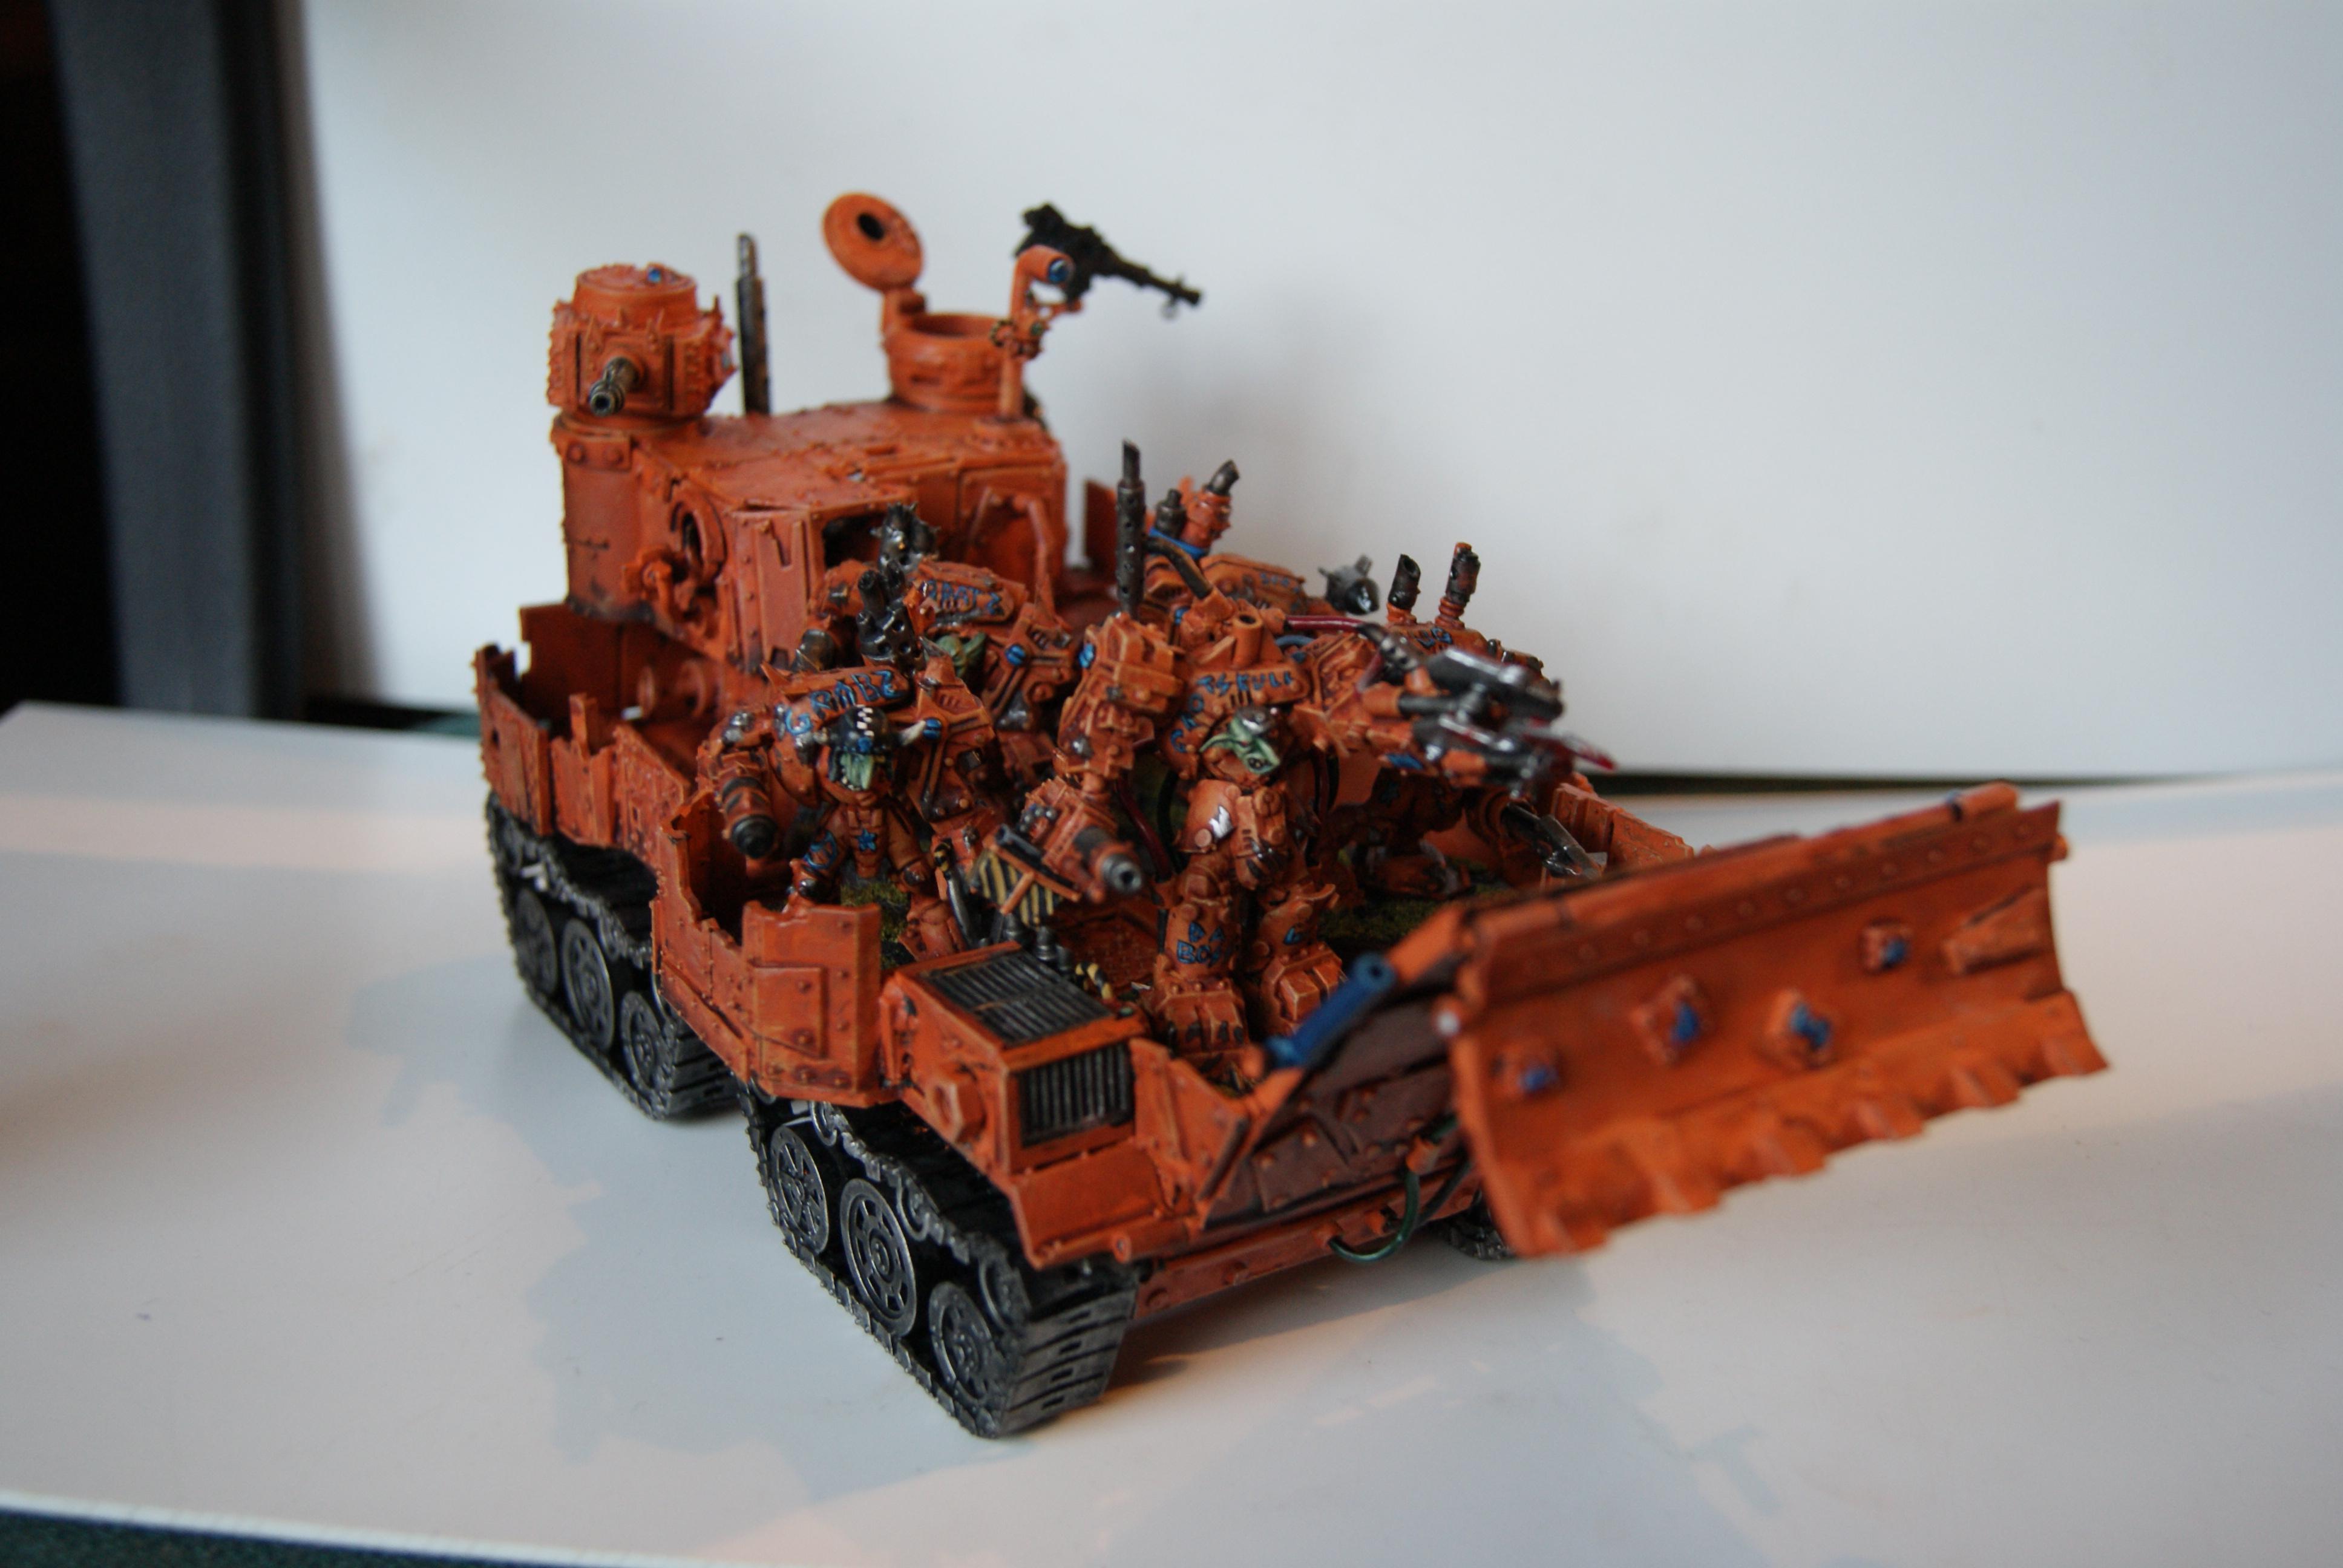 Battlewagon, Conversion, Grot Rebellion, Grot Rebels, Warhammer 40,000, Wi